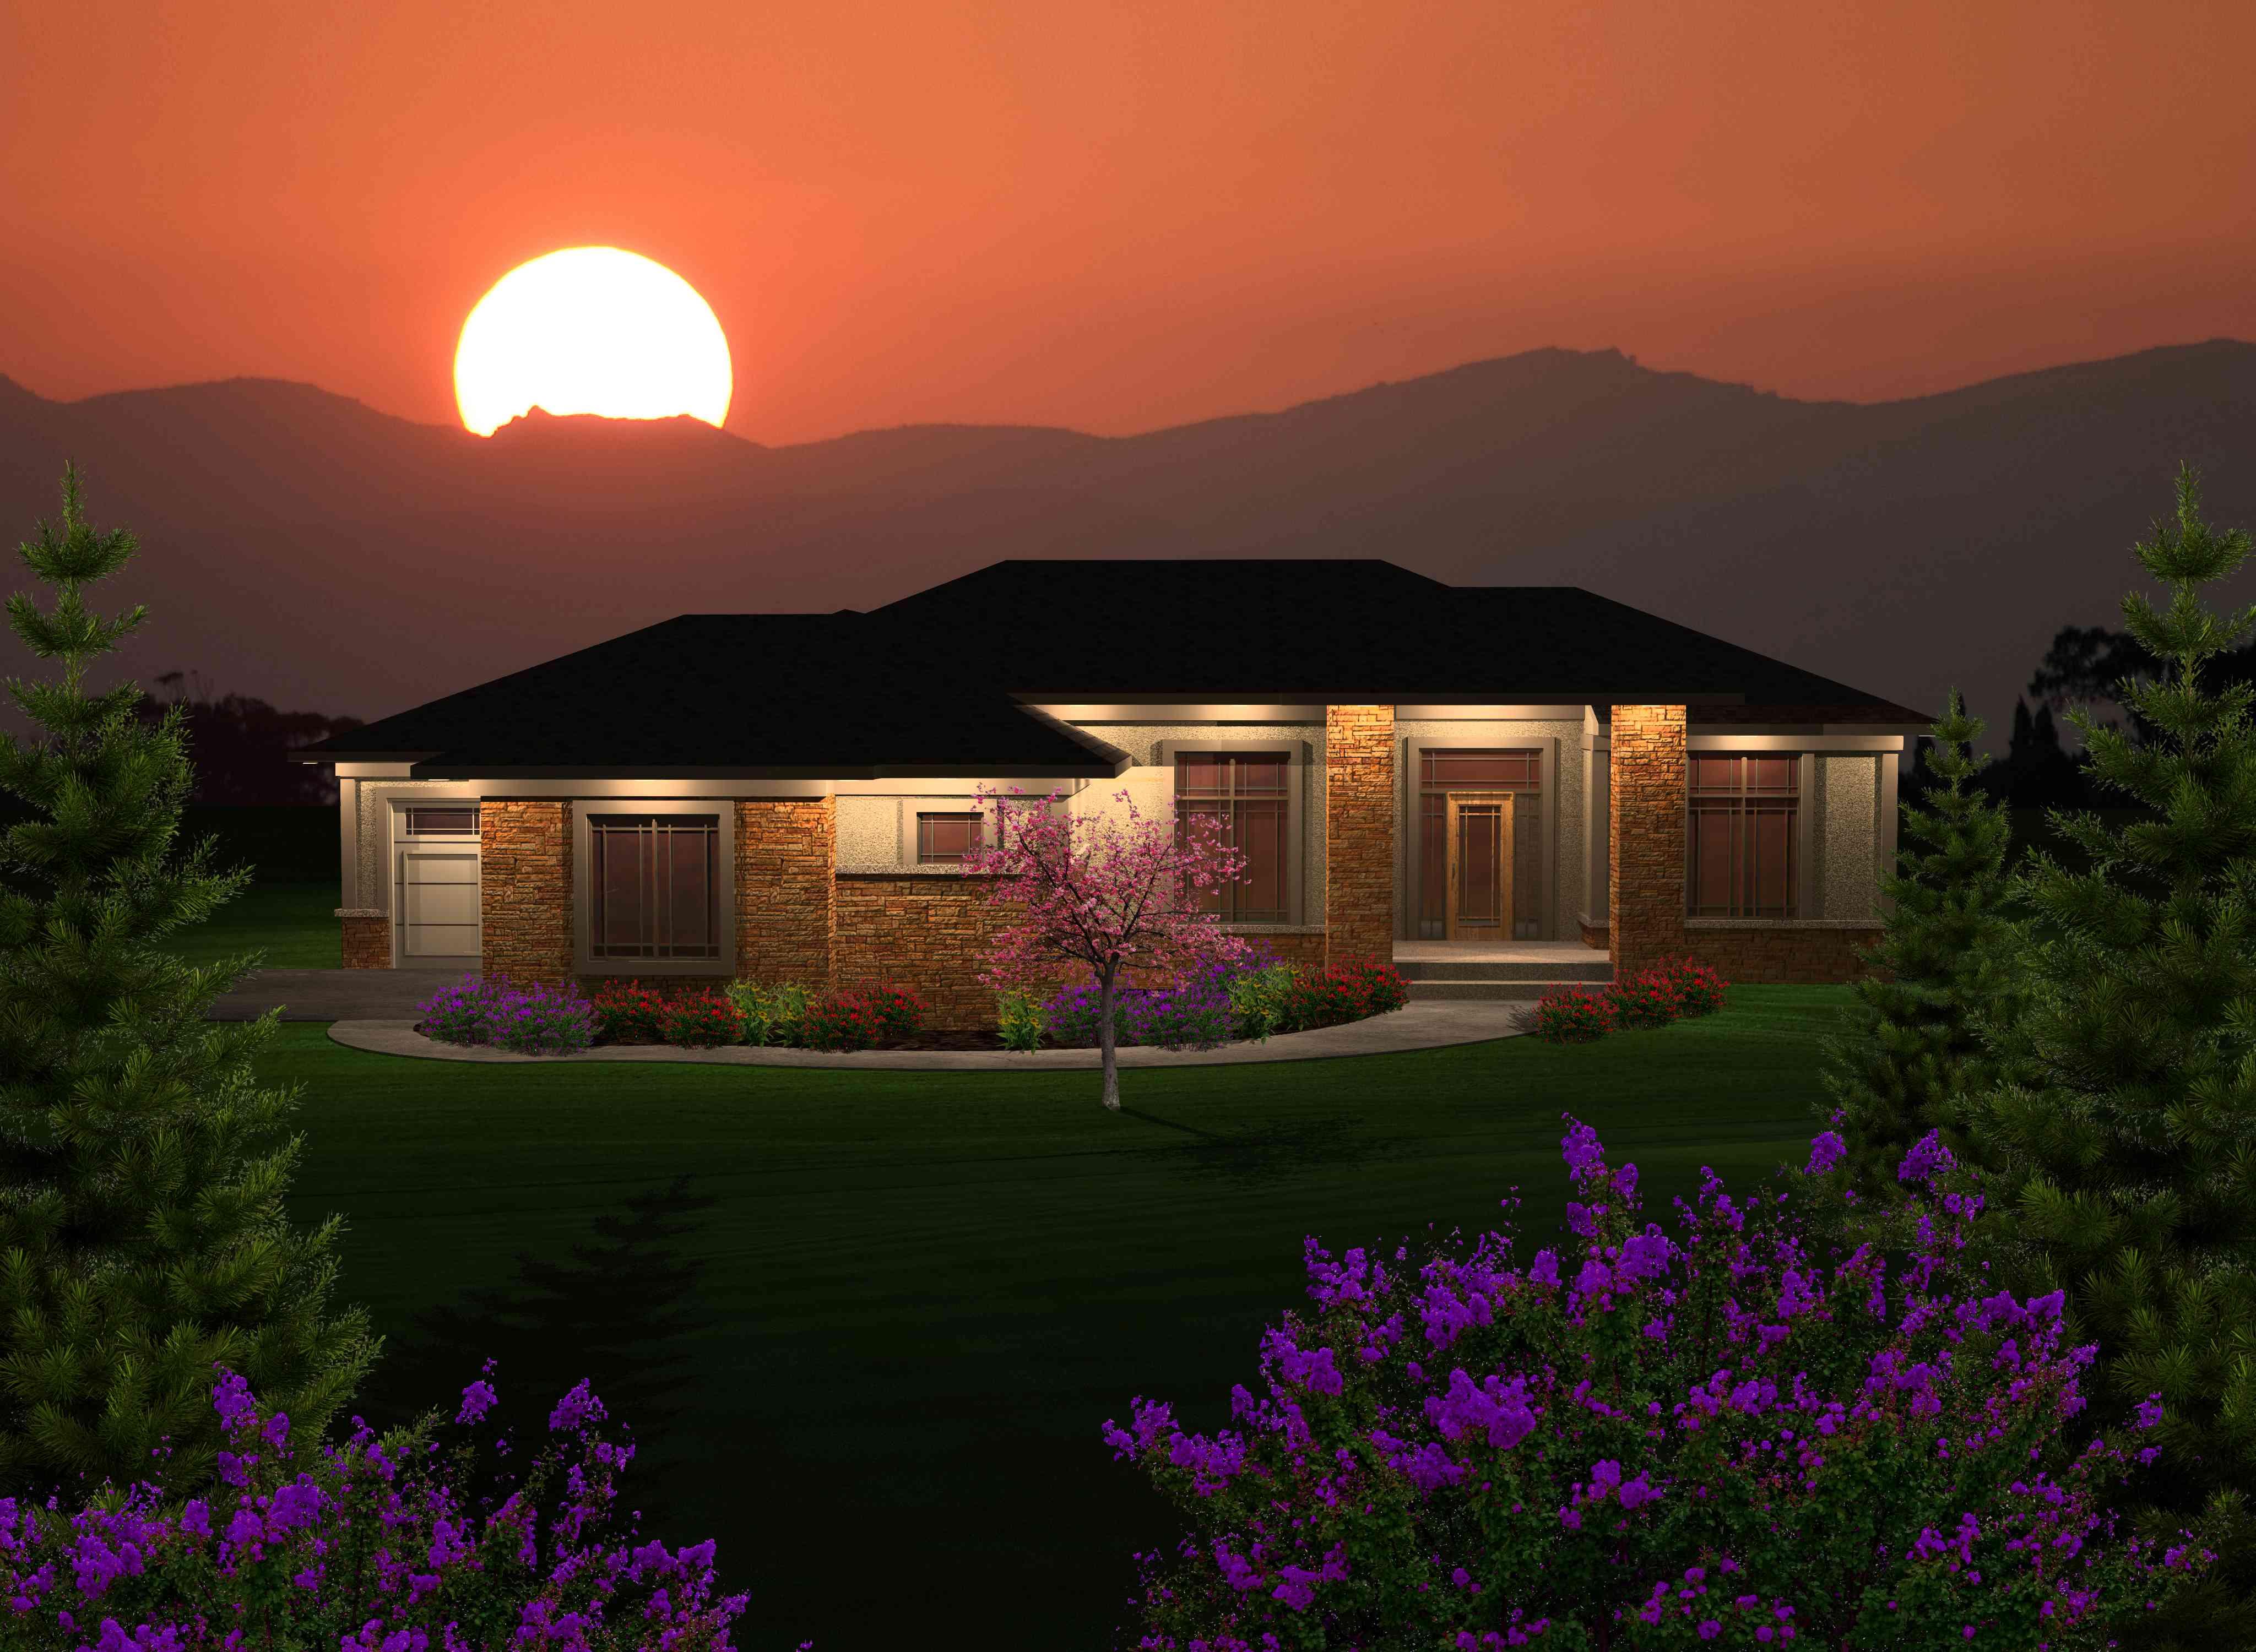 3 bedroom prairie ranch house plan 89870ah 1st floor for Prairie style ranch home designs